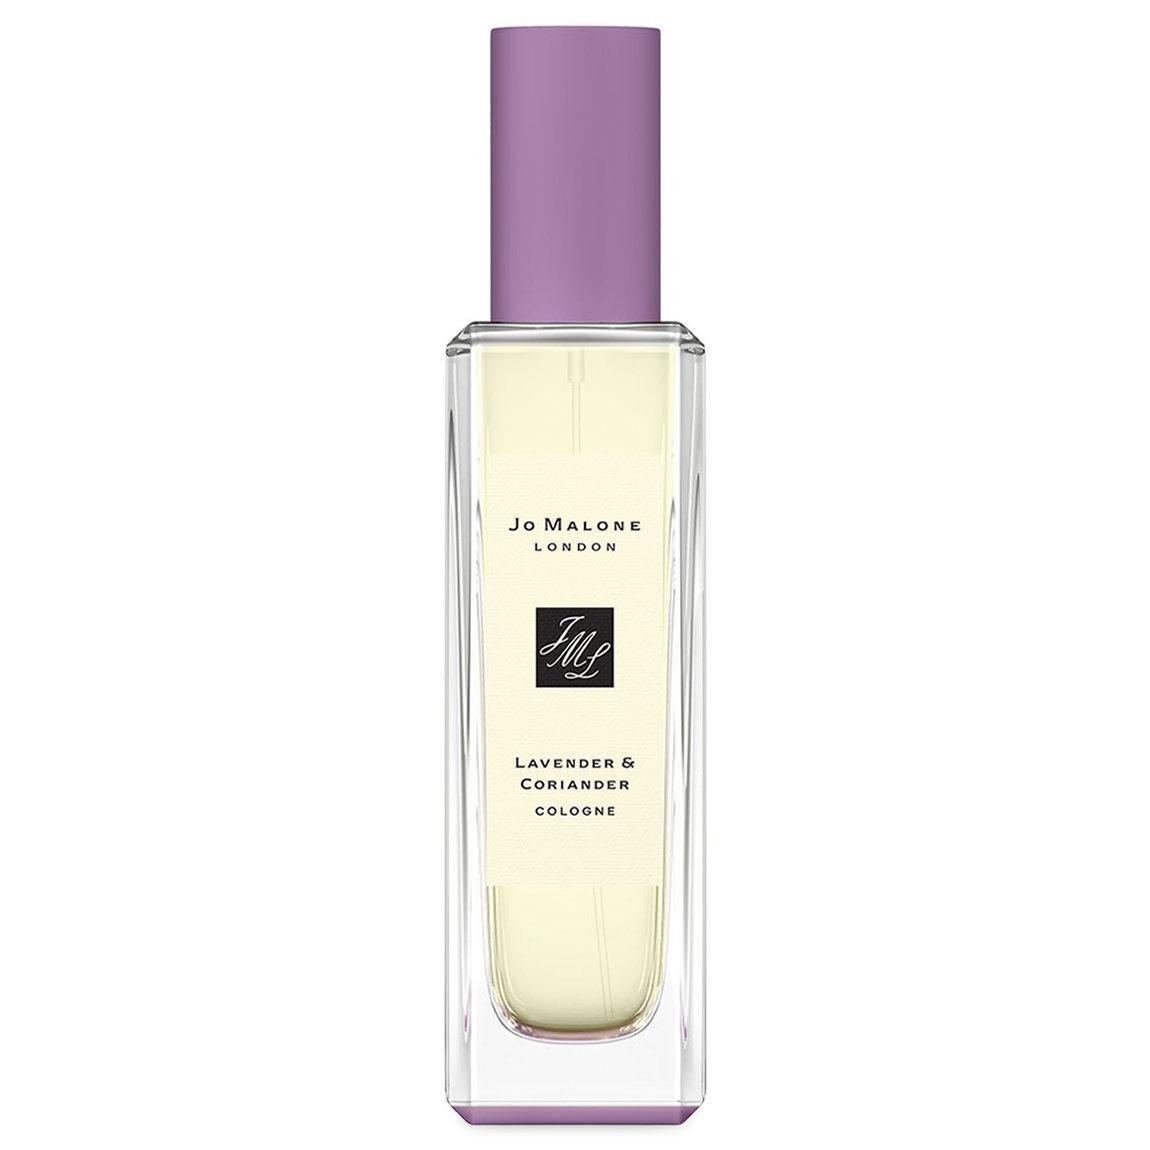 Jo Malone London Lavender & Coriander Cologne product swatch.